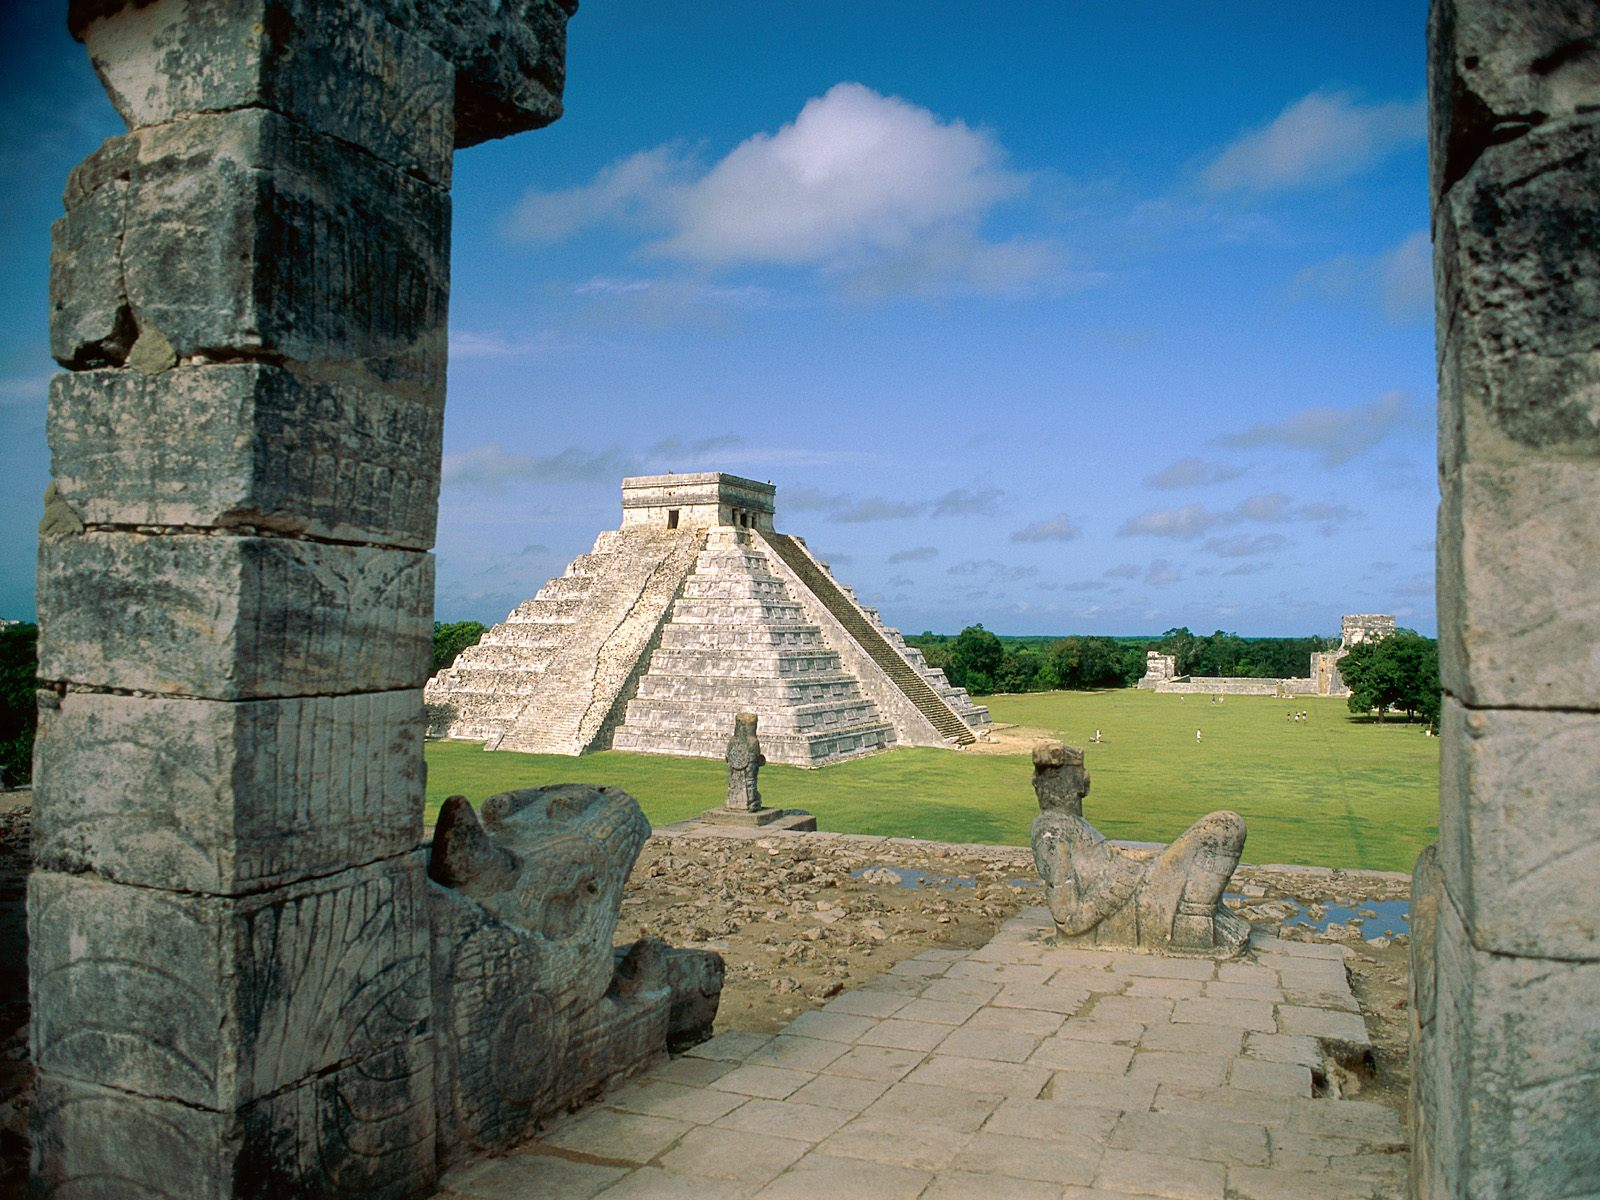 http://3.bp.blogspot.com/-WUhH7YDMzec/Trd3r6pM-cI/AAAAAAAADq0/yUt6wNtDKKo/s1600/Mexico+pyramids+Kukulkan++chichen+itza+HD+Wallpapers+6.jpg